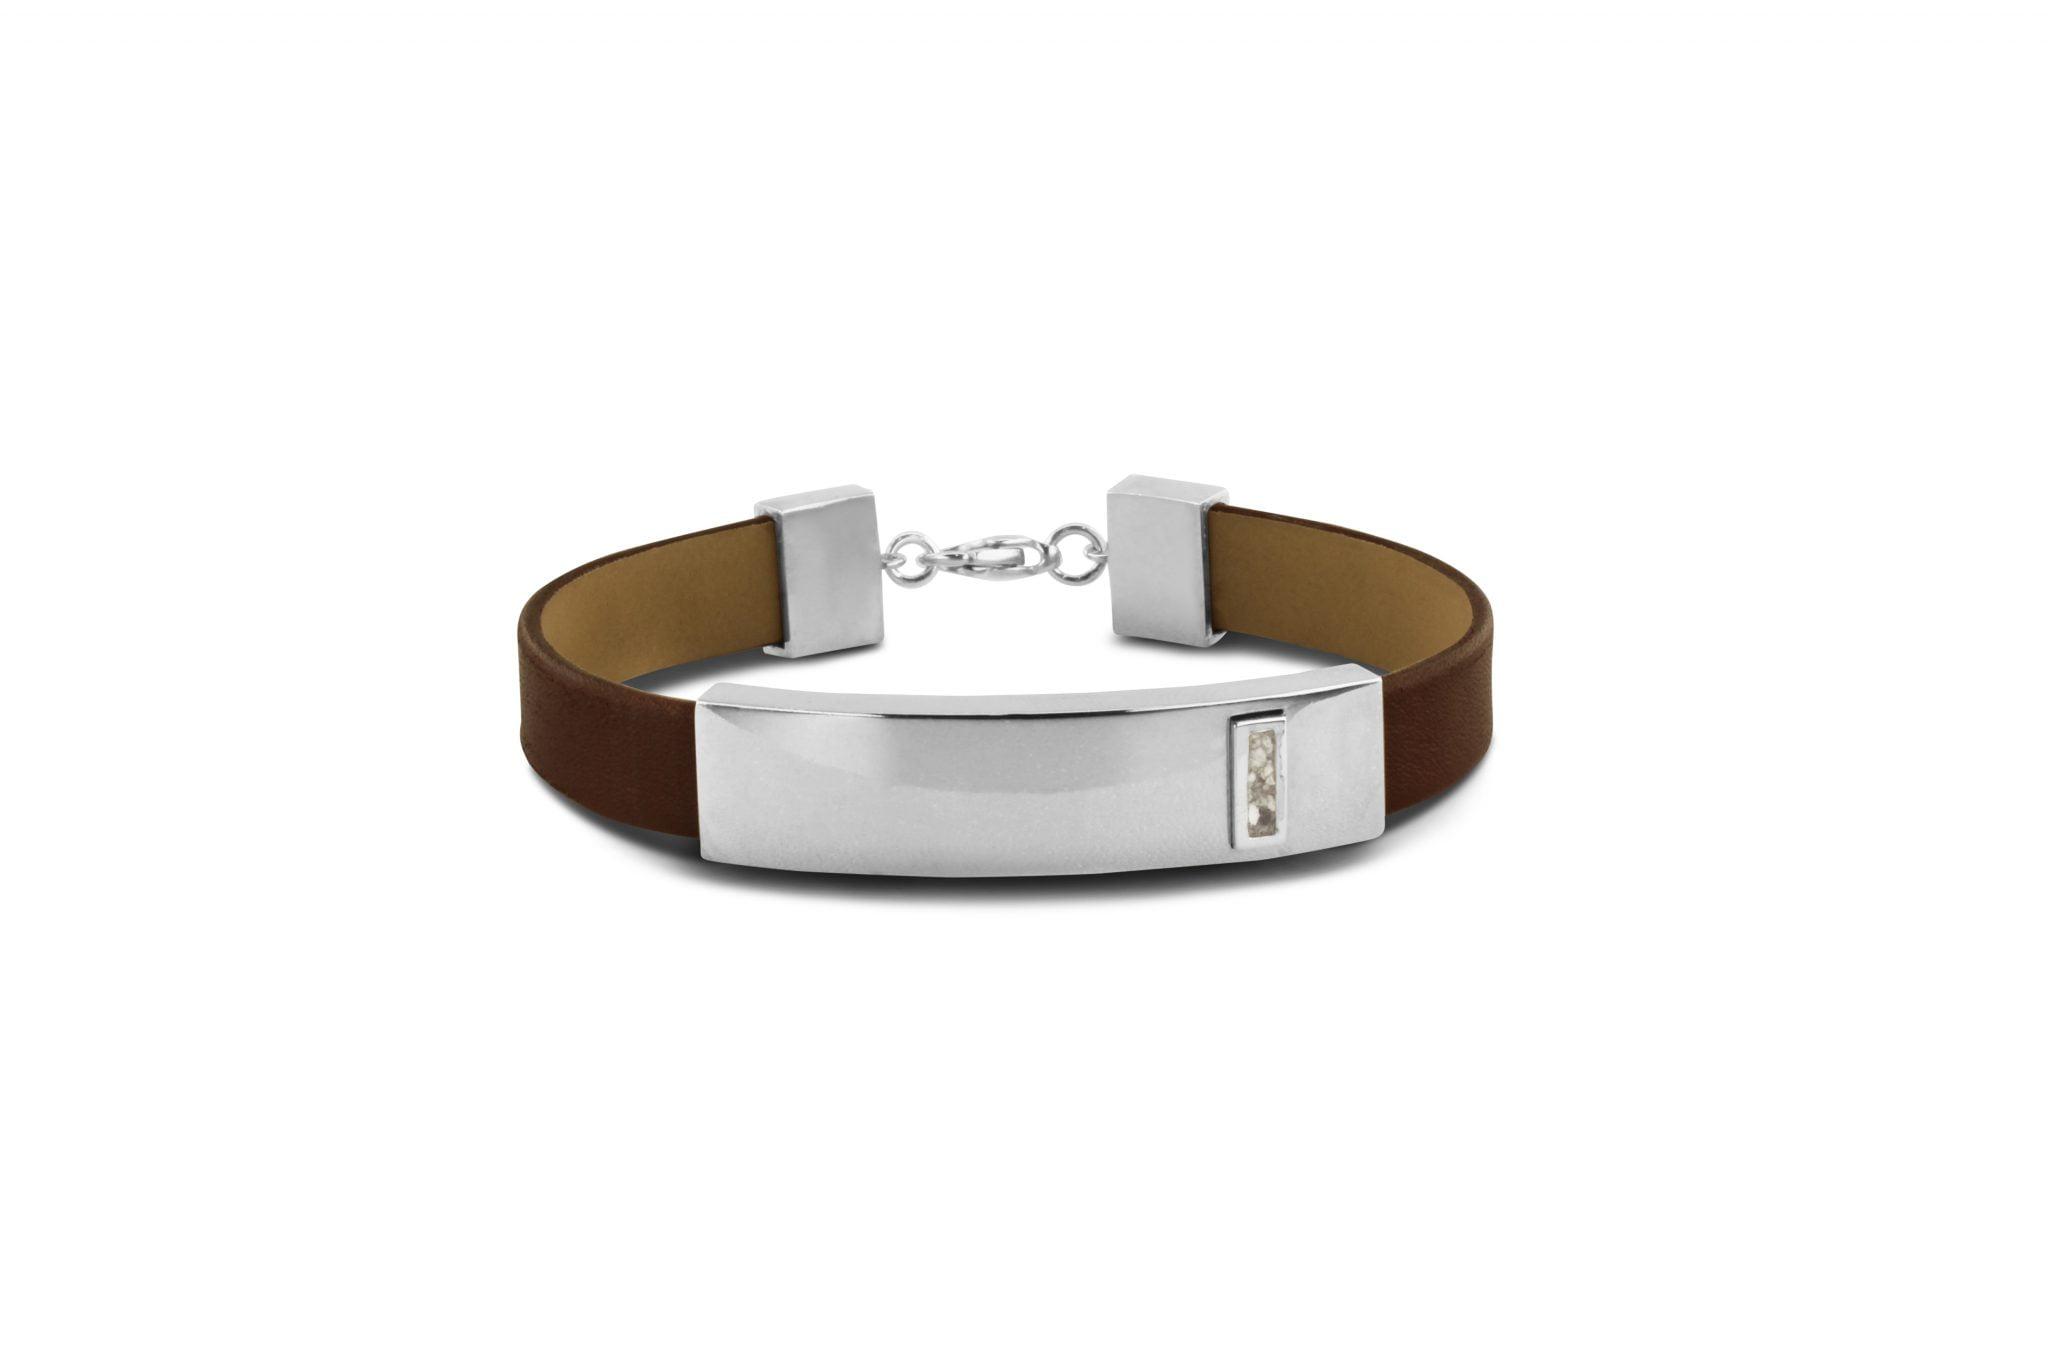 gedenksieraad armband met lederen bandje BG 010